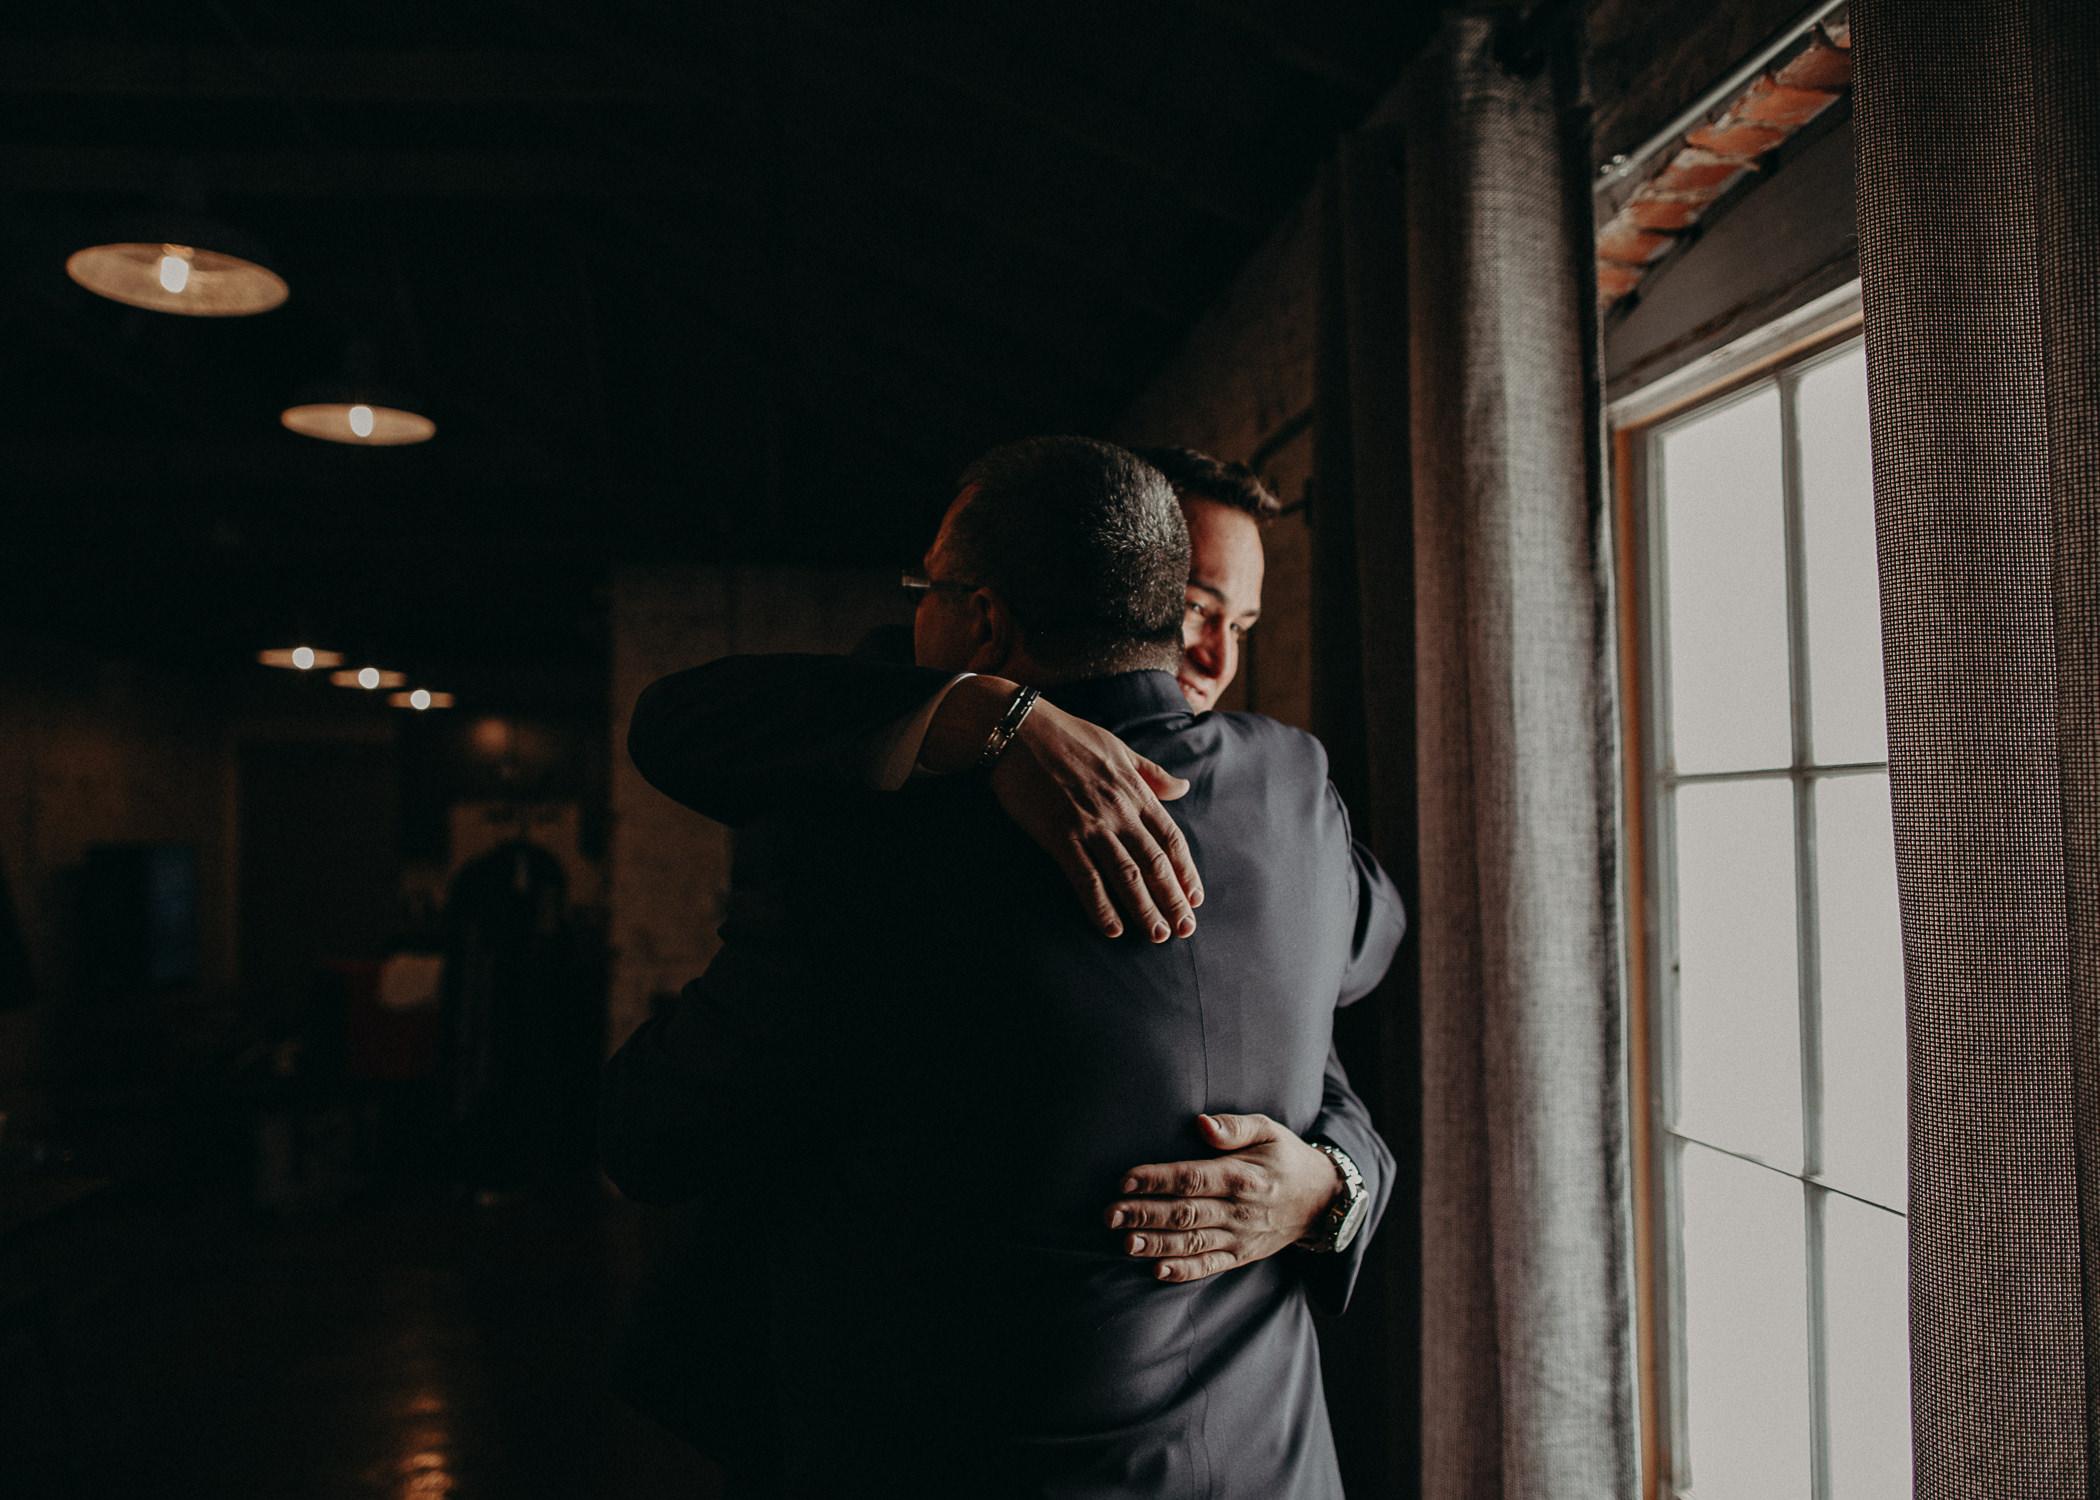 6 4 - Atlanta Wedding Photographer - The engine room - Ga - Wedding trends - Aline Marin Photography.jpg